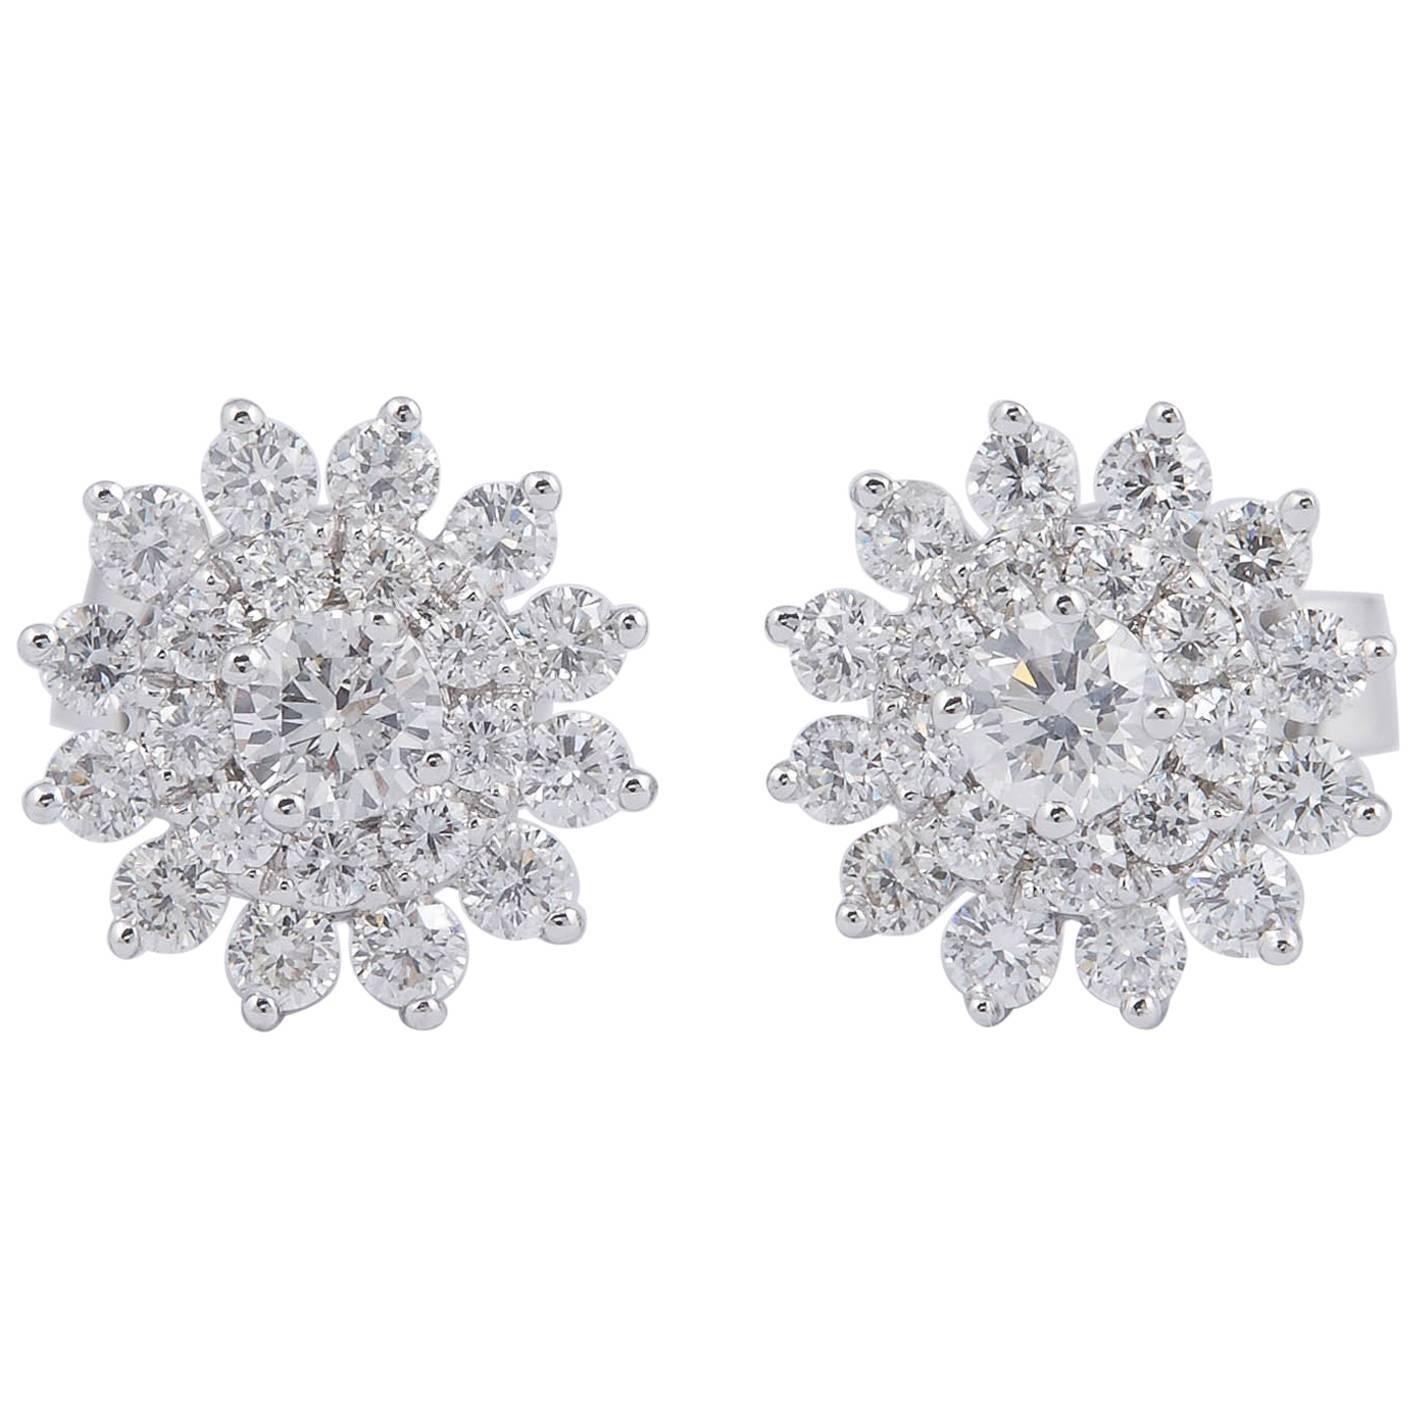 Diamond Cluster Star shaped Earrings Studs